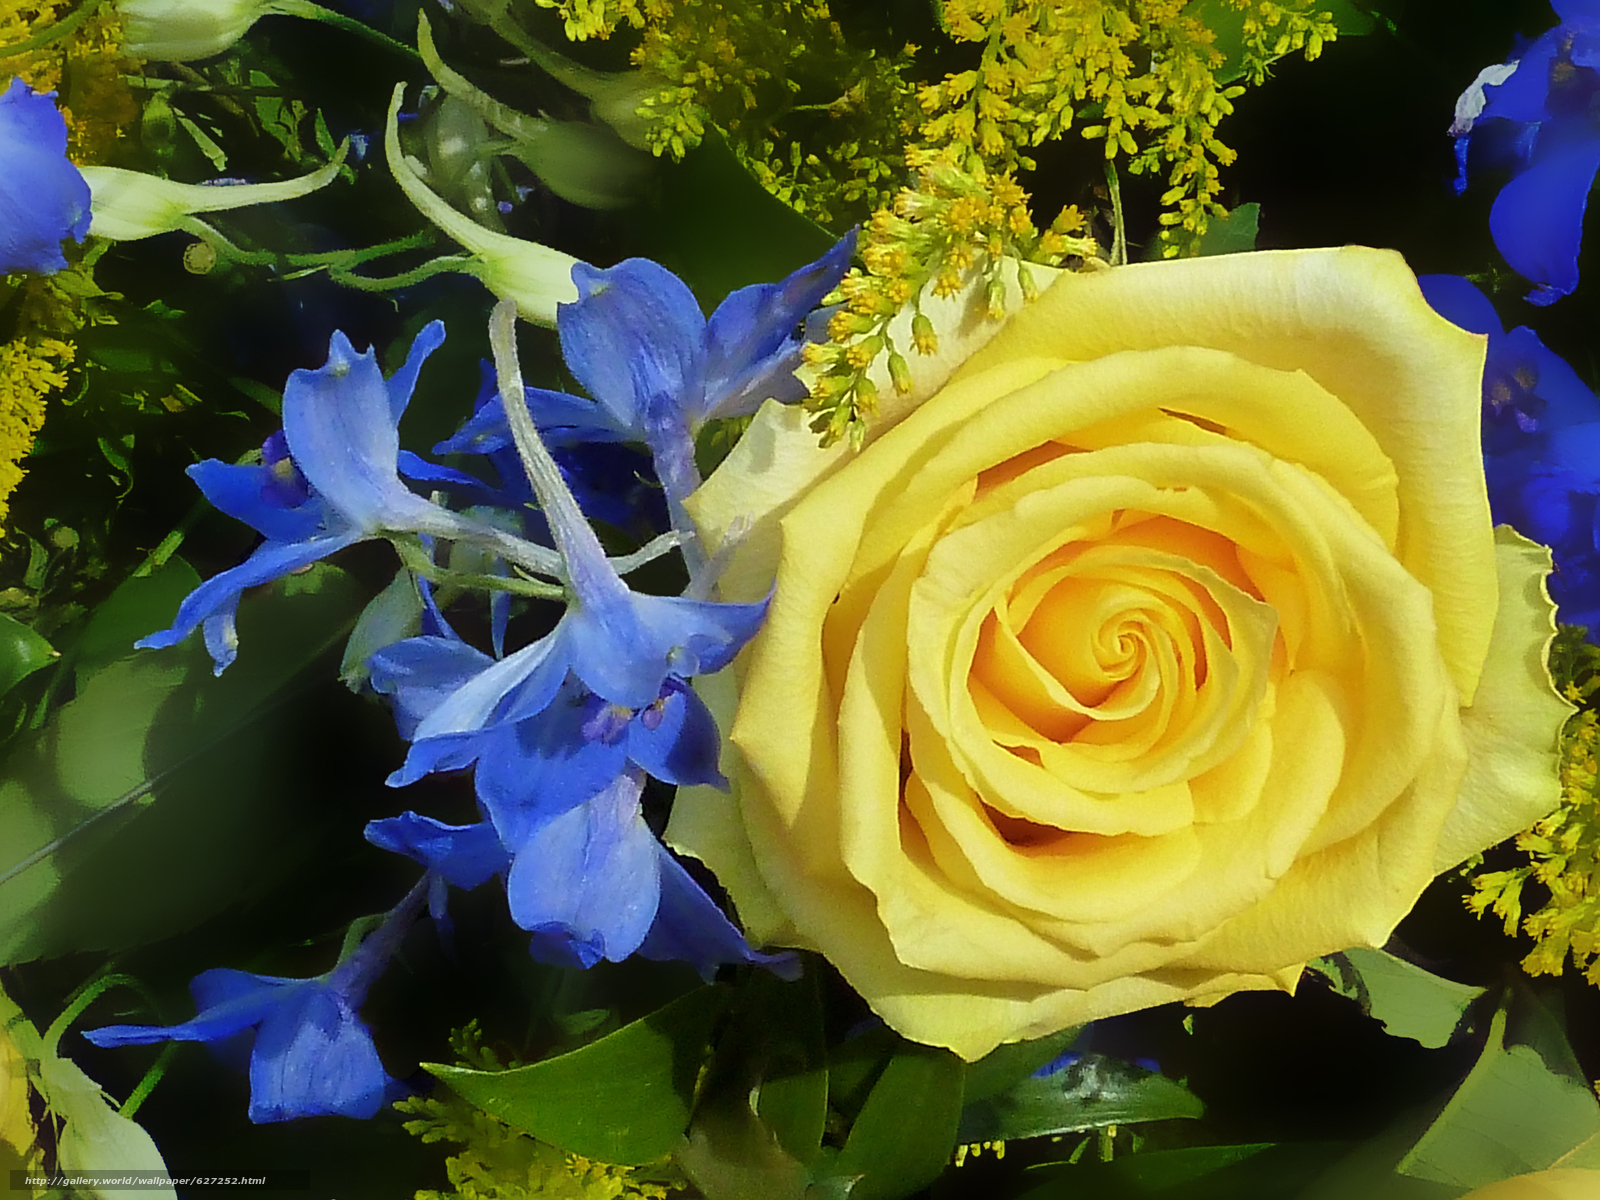 Скачать на телефон обои фото картинку на тему роза, цветы, флора, разширение 2048x1536